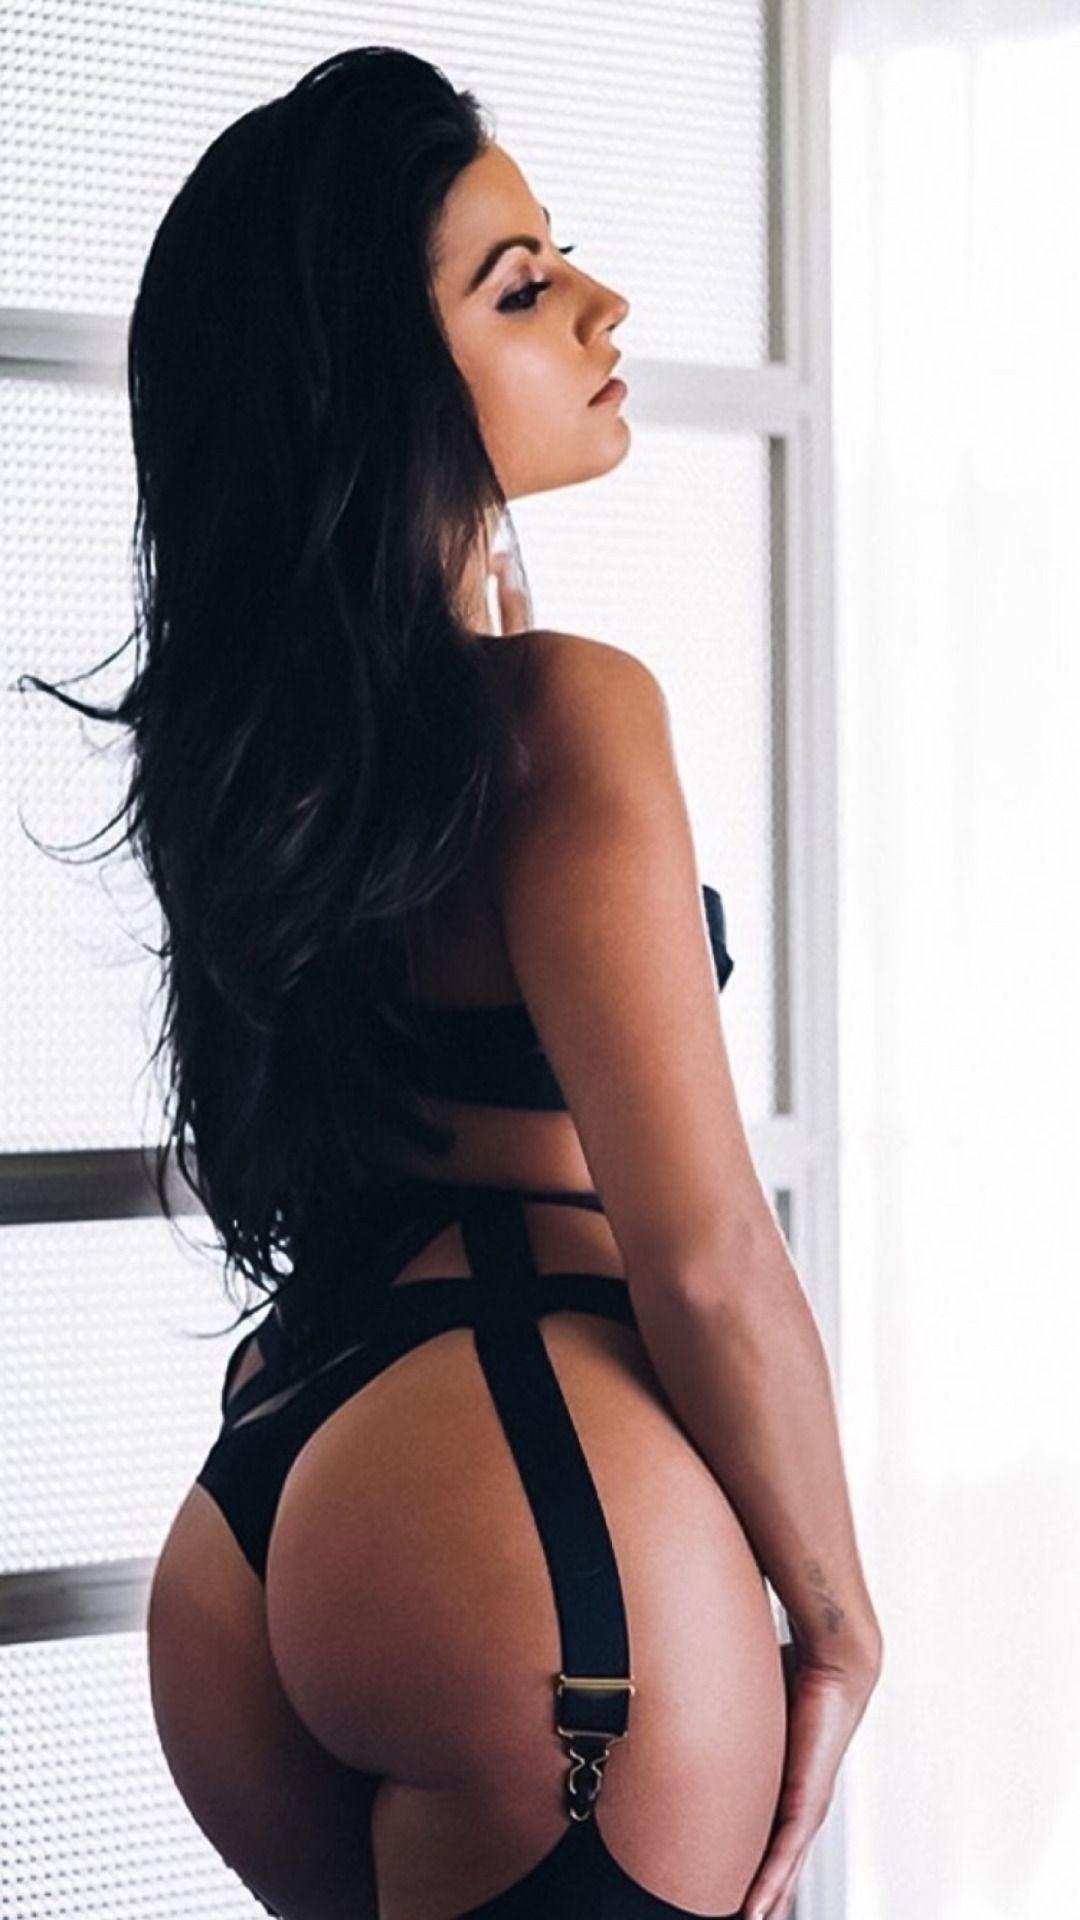 Snapchat Monica Alvarez nude photos 2019